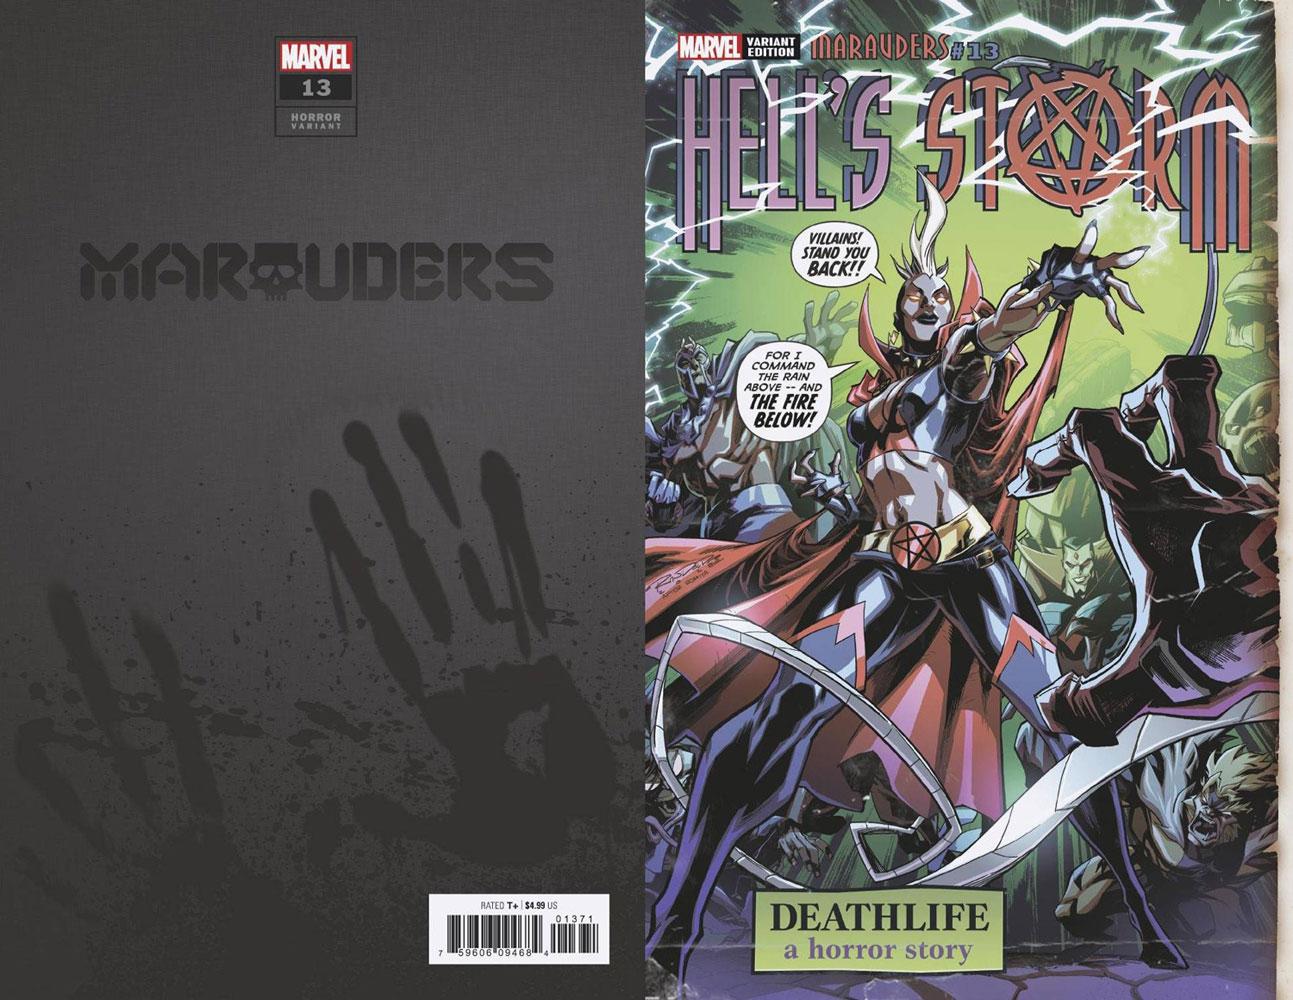 Marauders #13 (variant Hell's Storm cover - Randolph)  [2020] - Marvel Comics